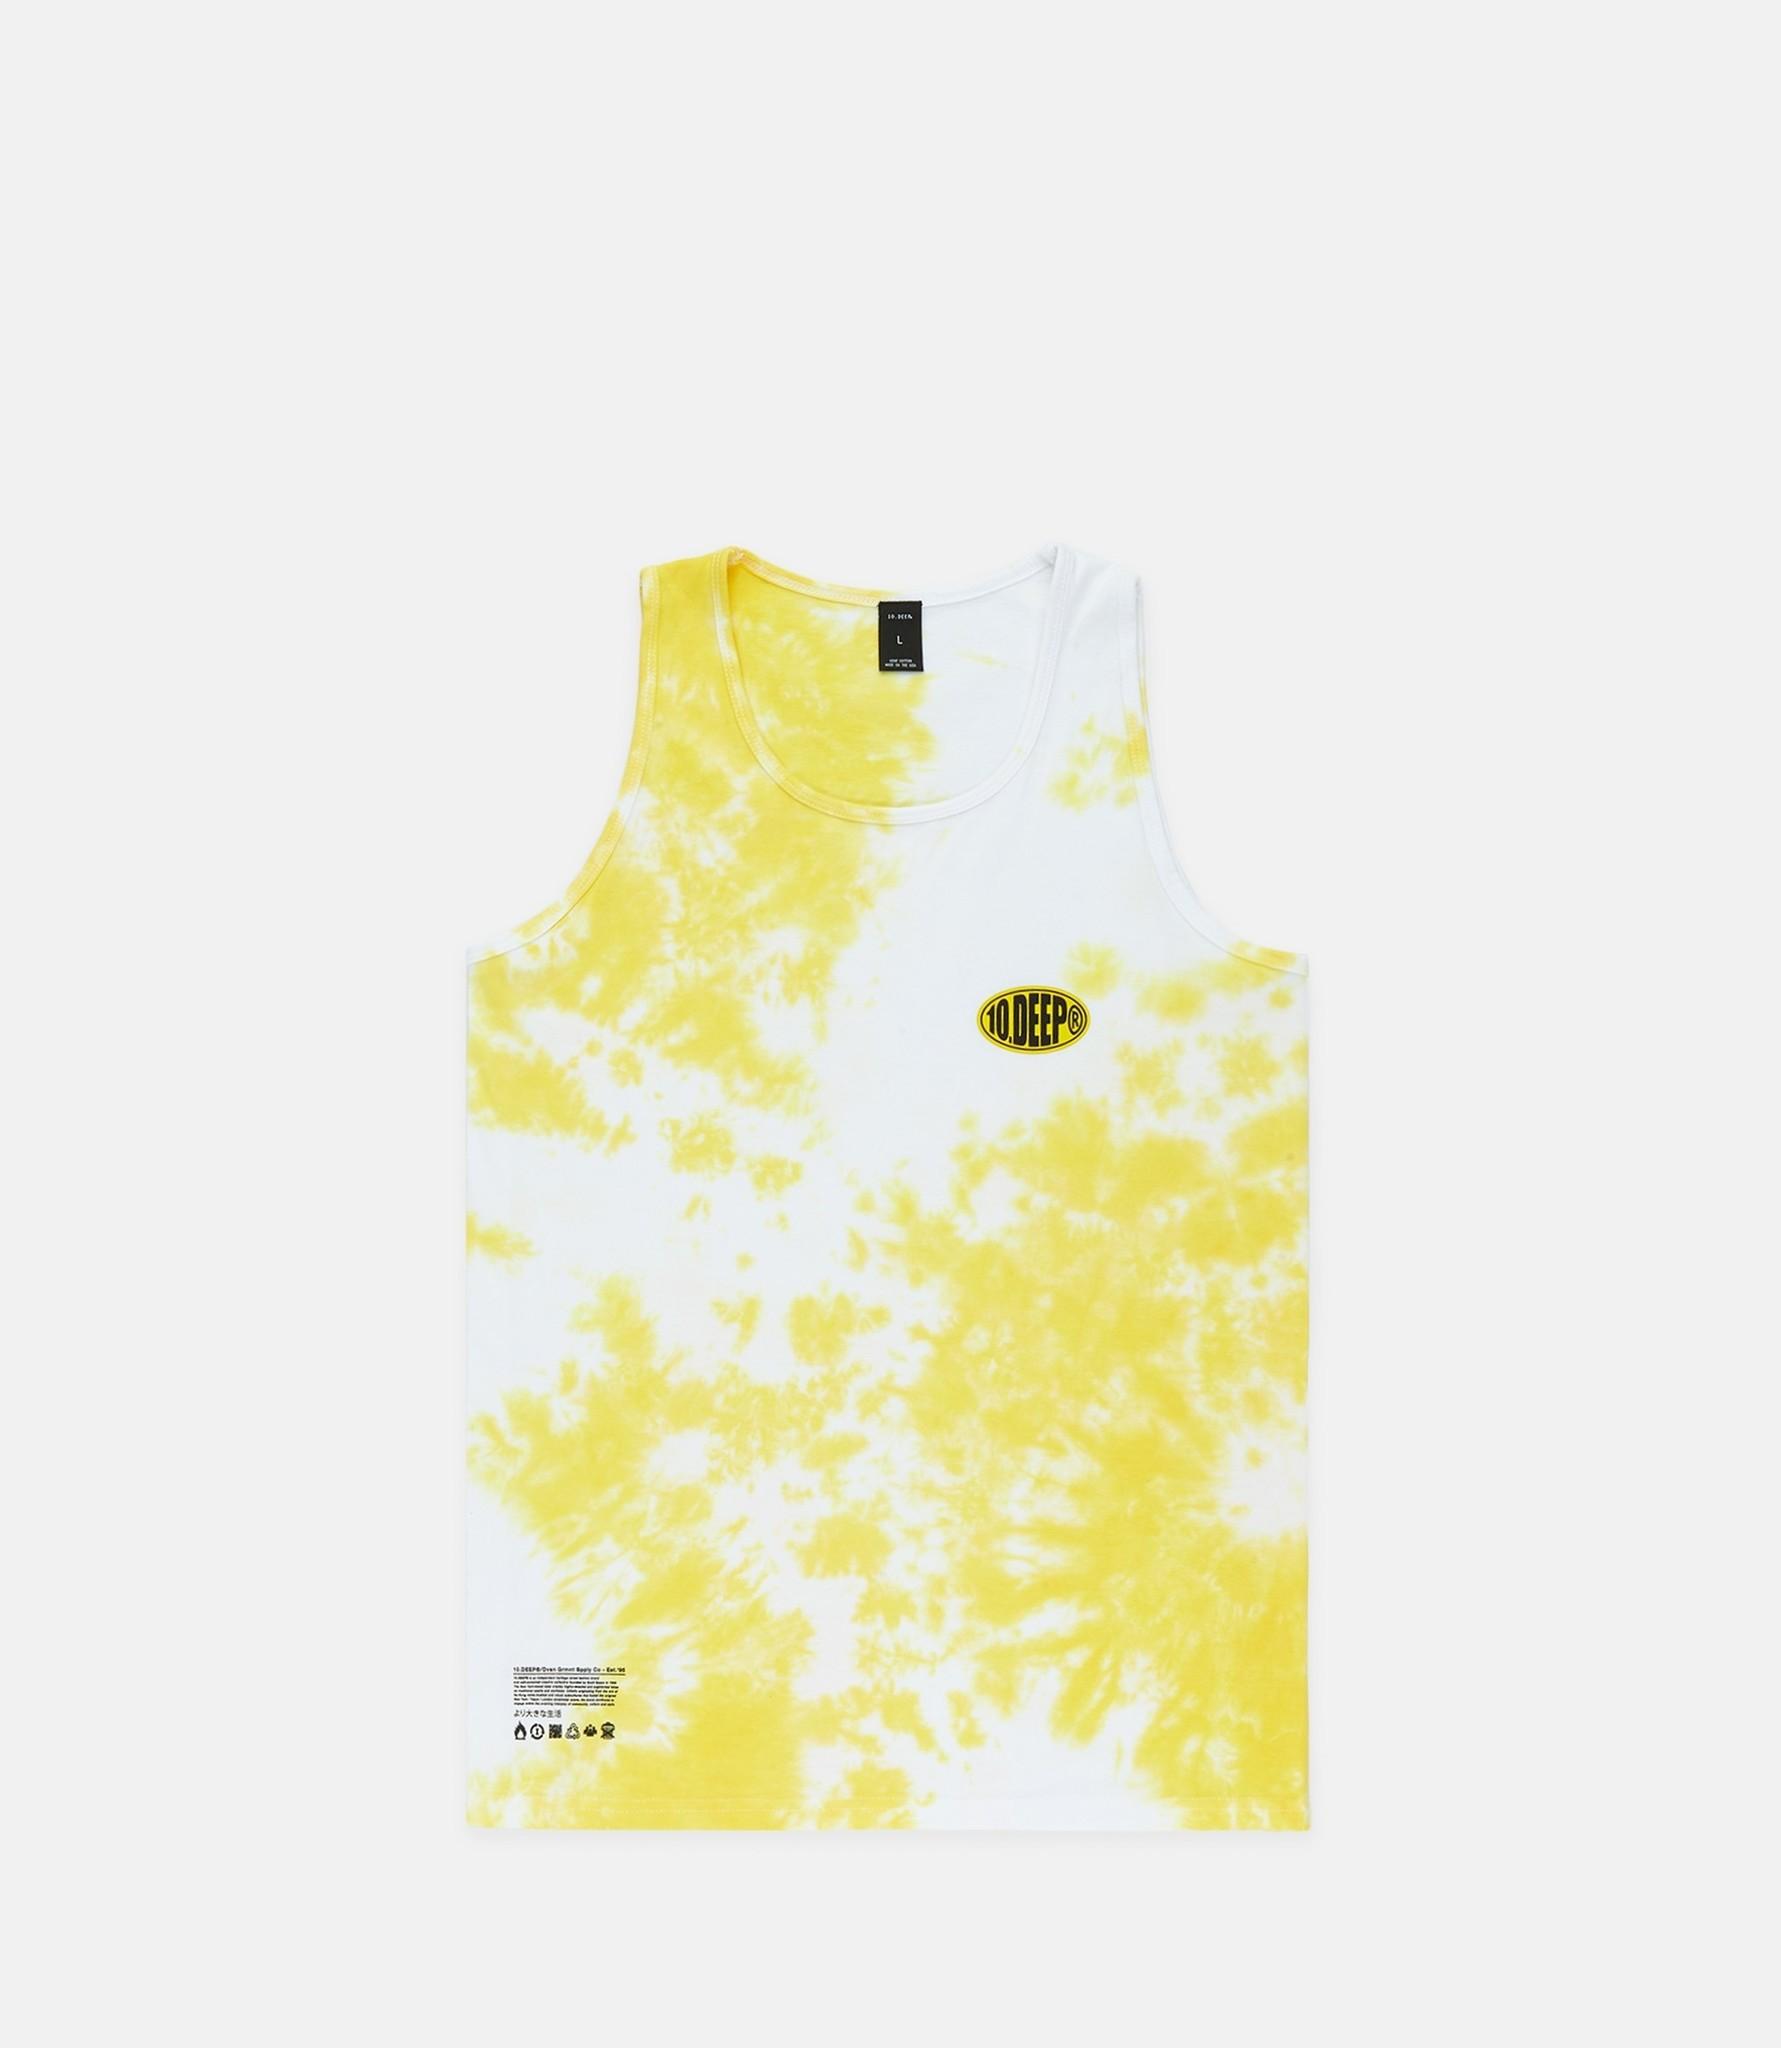 10 Deep 10 Deep Conglomerate Tank Yellow